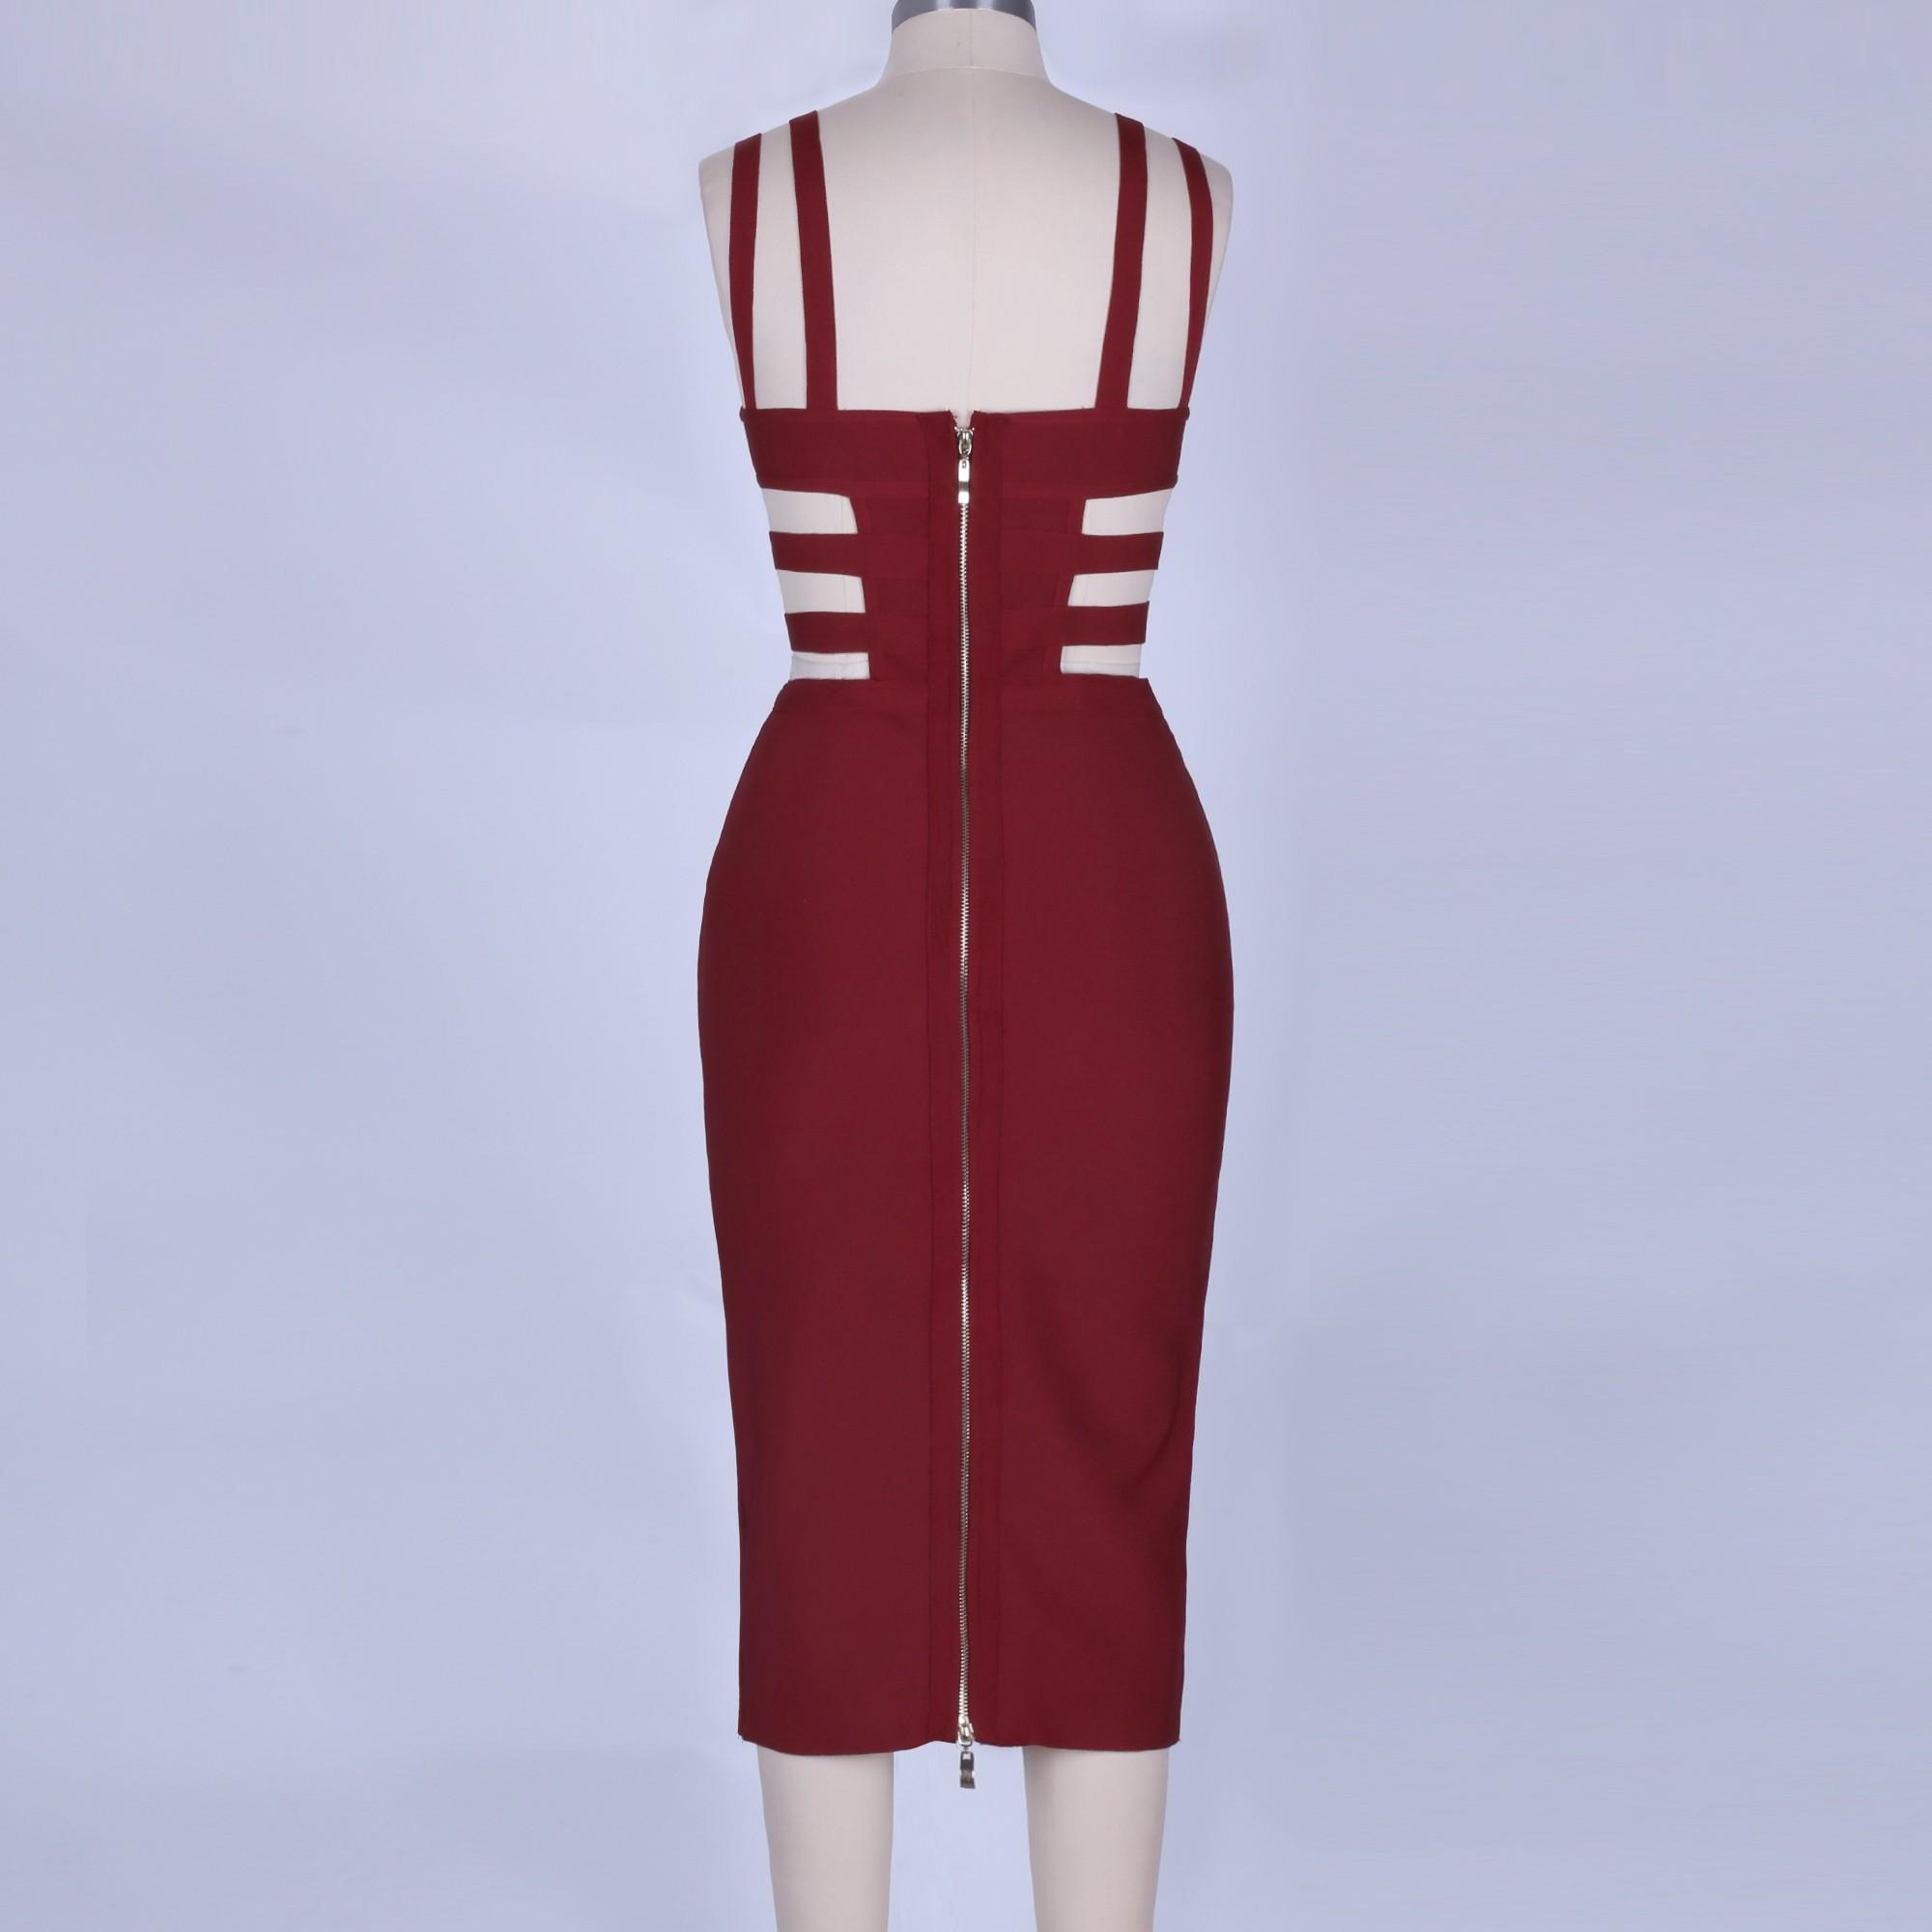 Wine Strap Sleeveless Mini Metal Studded Fashion Bandage Dress POHJ676-Wine